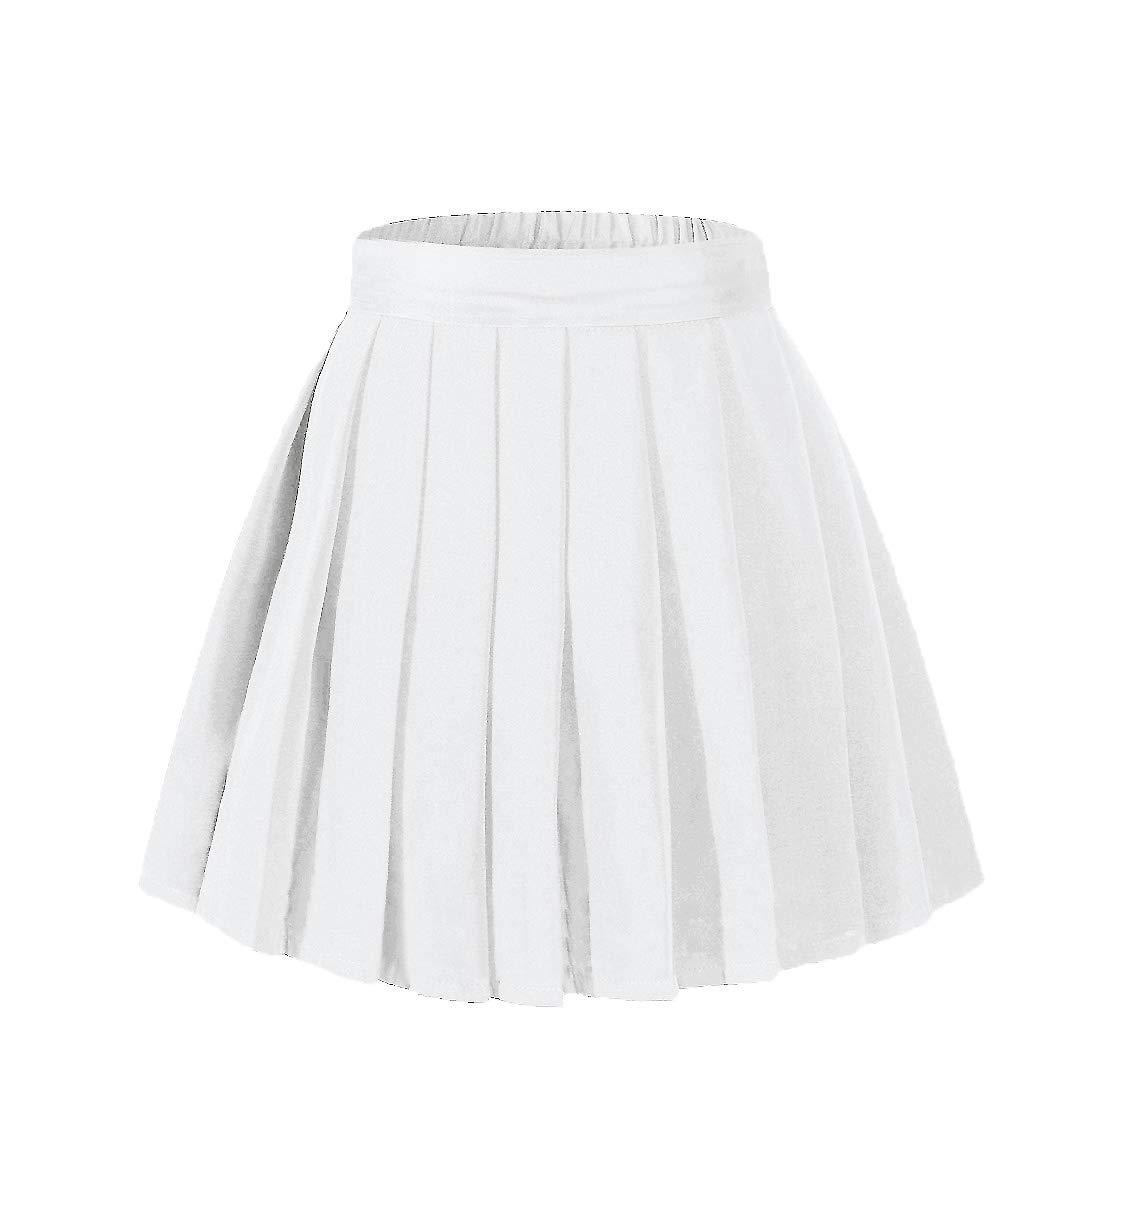 Beautifulfashionlife Women's Plus Size Solid Uniform Skirts with Shorts White,2XL by Beautifulfashionlife